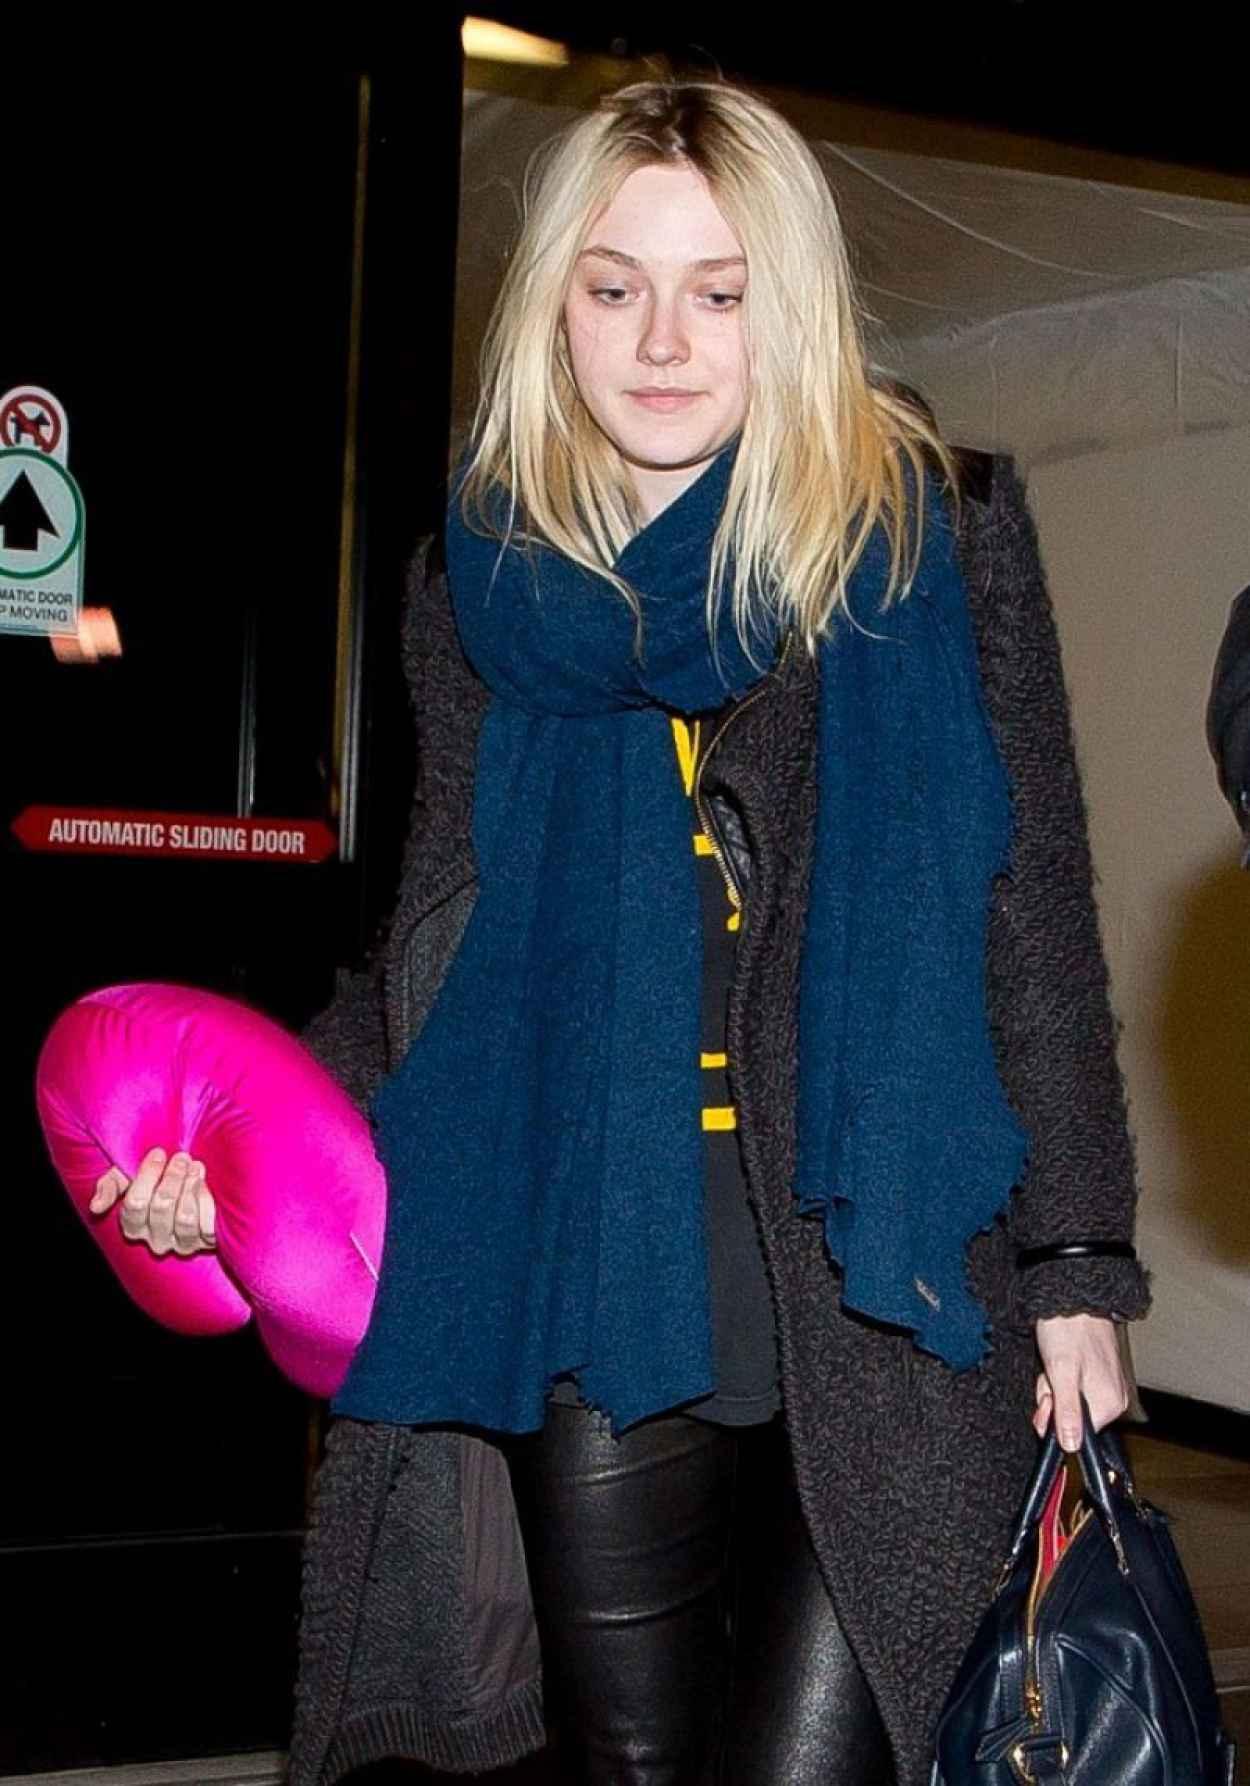 Dakota Fanning at LAX Airport, March 2015-1